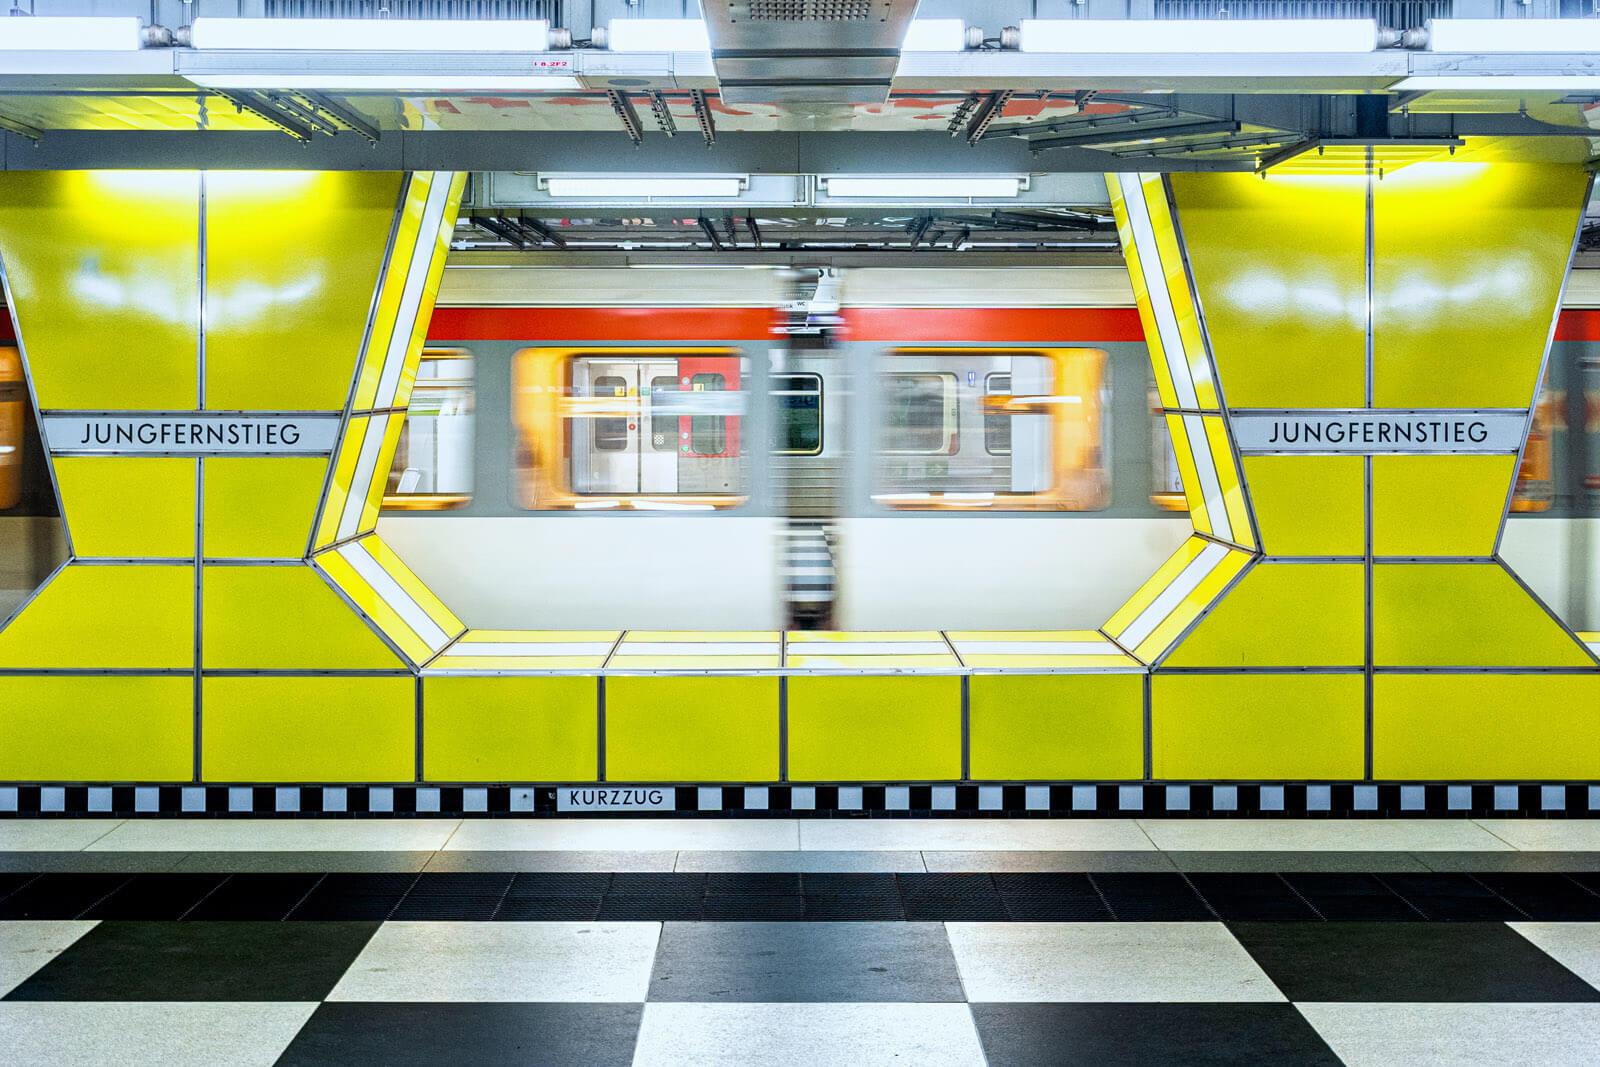 Jungfernstieg U-Bahnhof